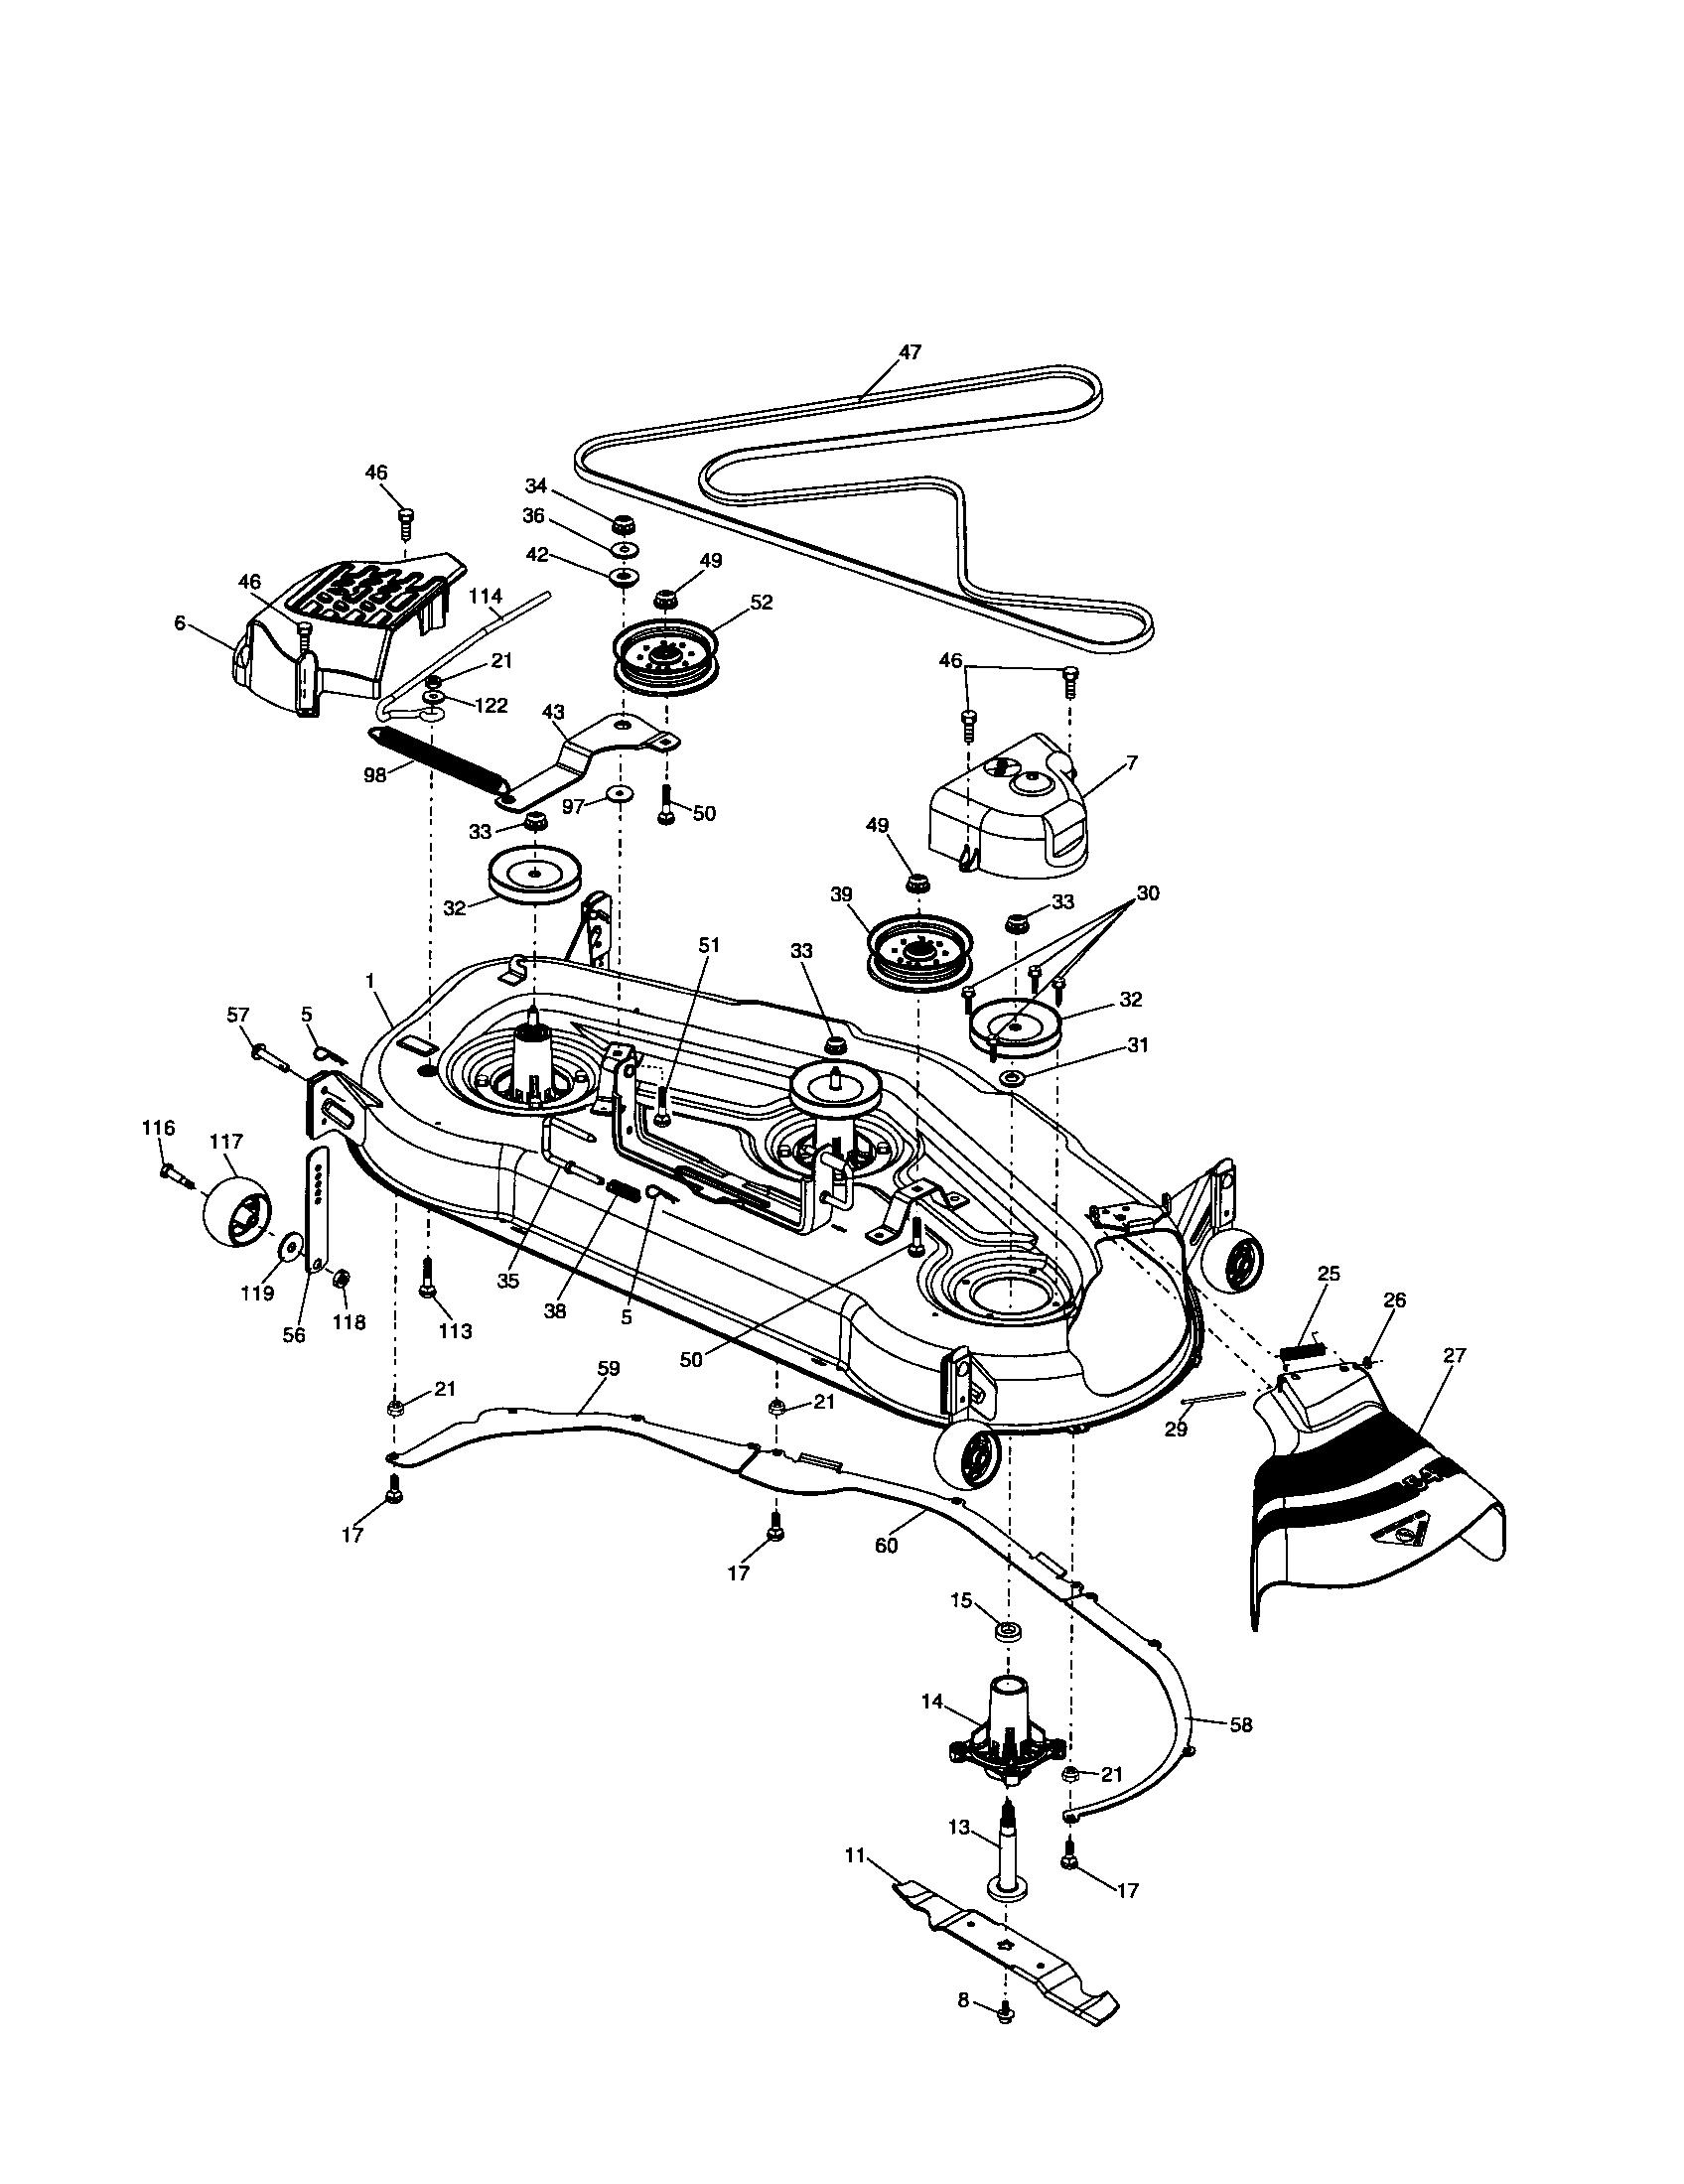 Wiring Diagram Craftsman Model 917 275671 Trusted Diagrams Mower 271832 Sears 917276640